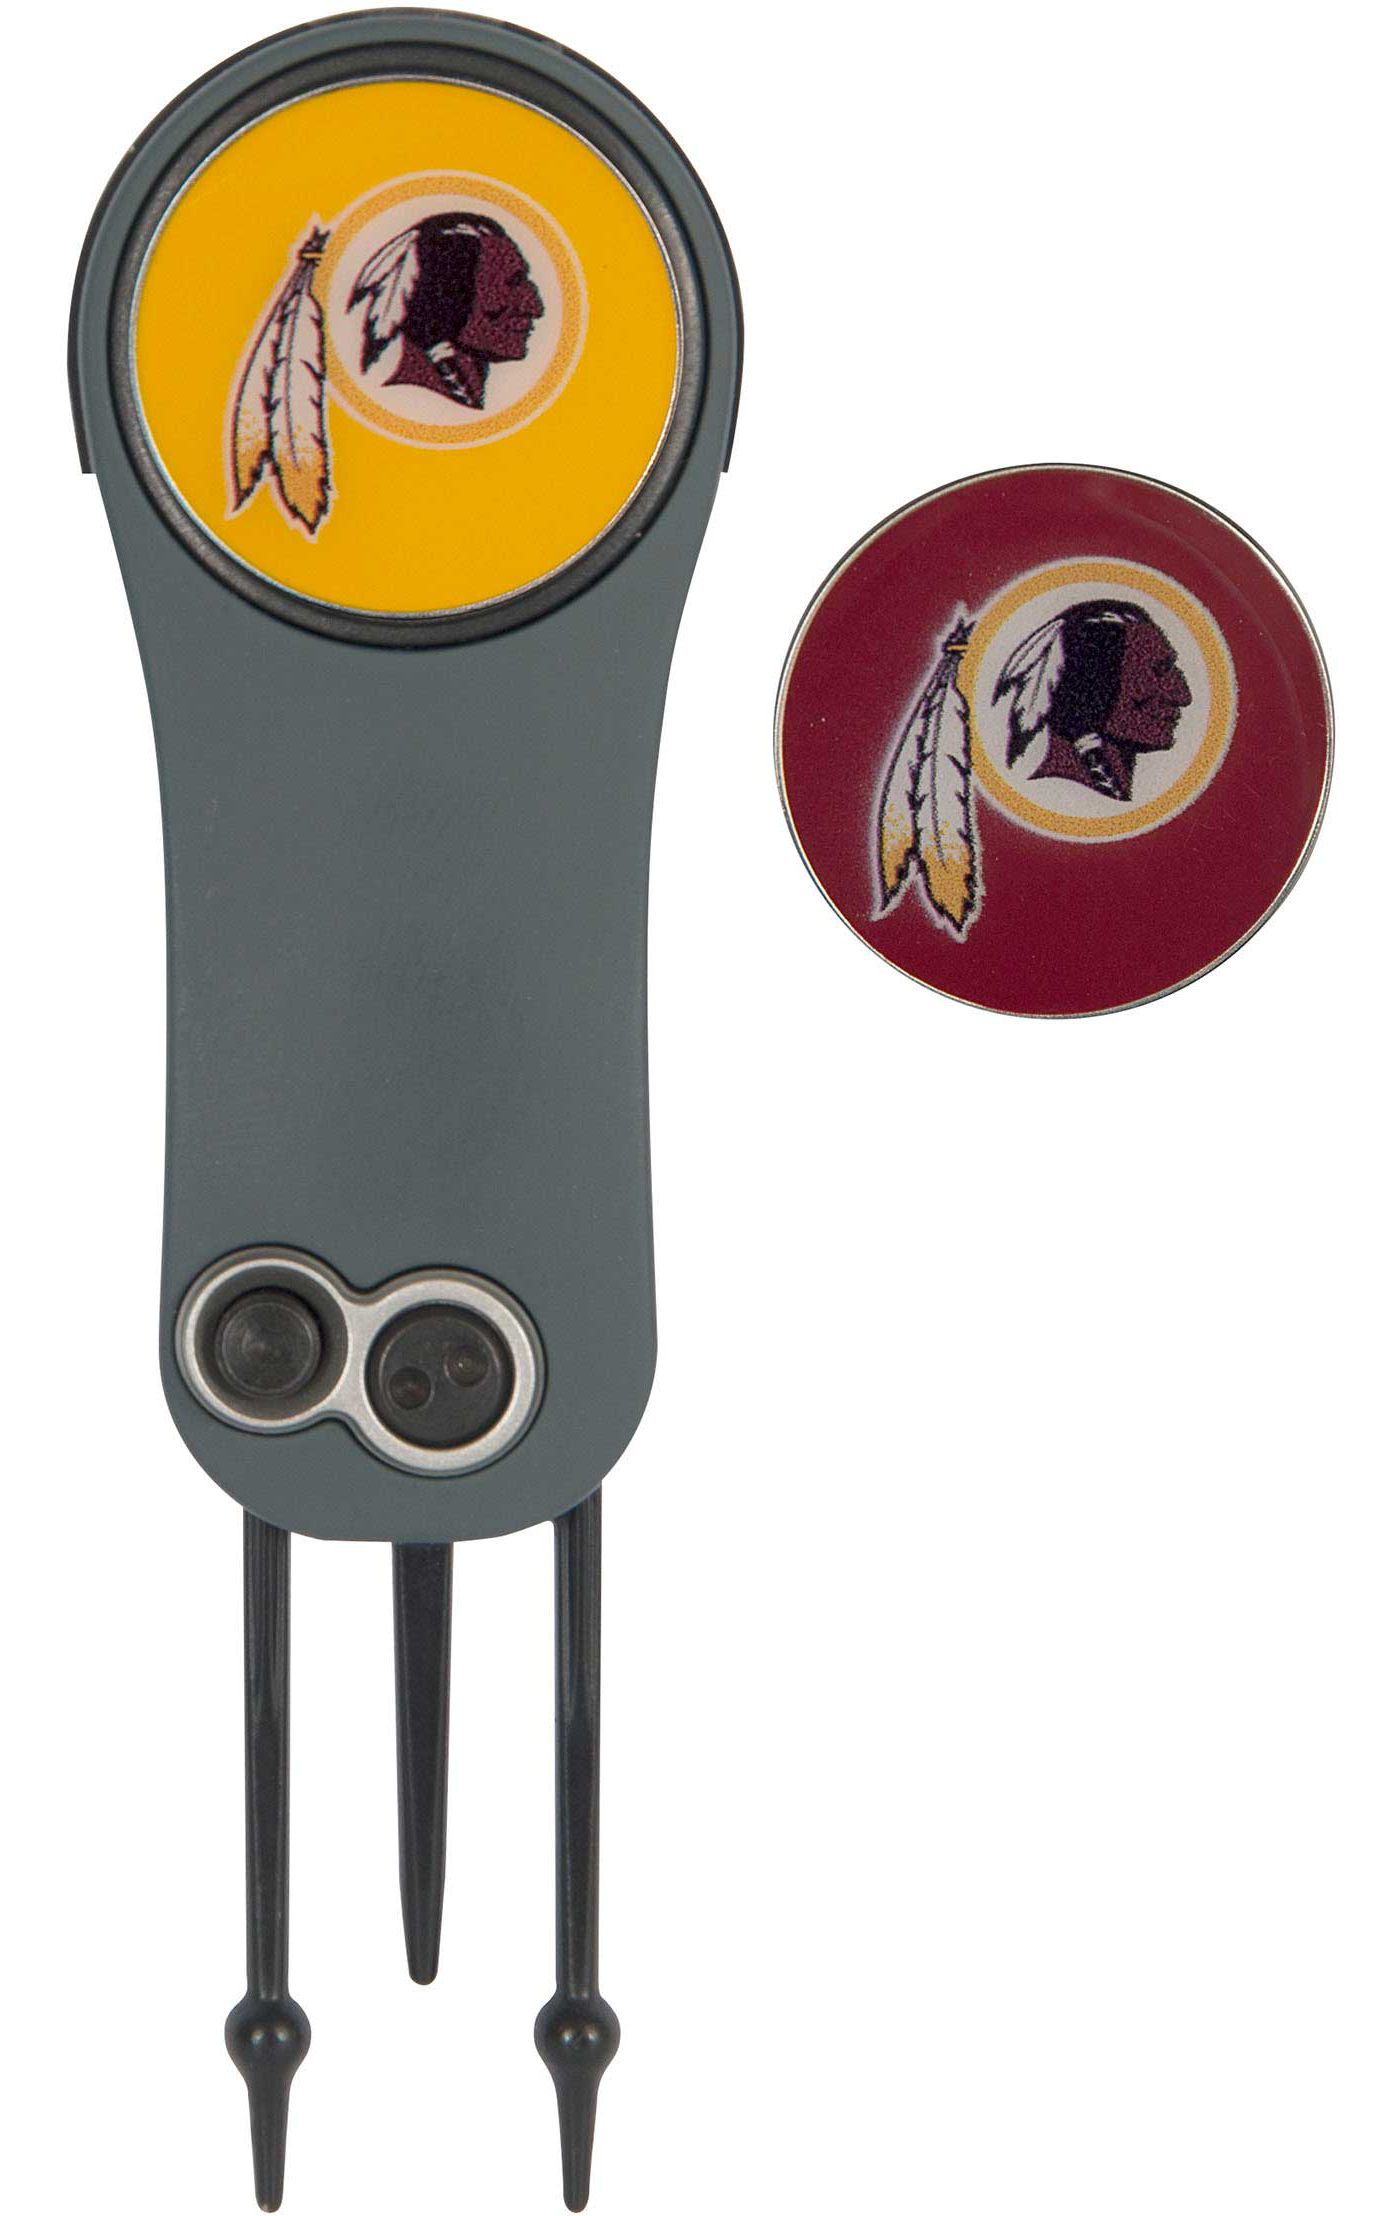 Team Effort Washington Redskins Switchblade Divot Tool and Ball Marker Set